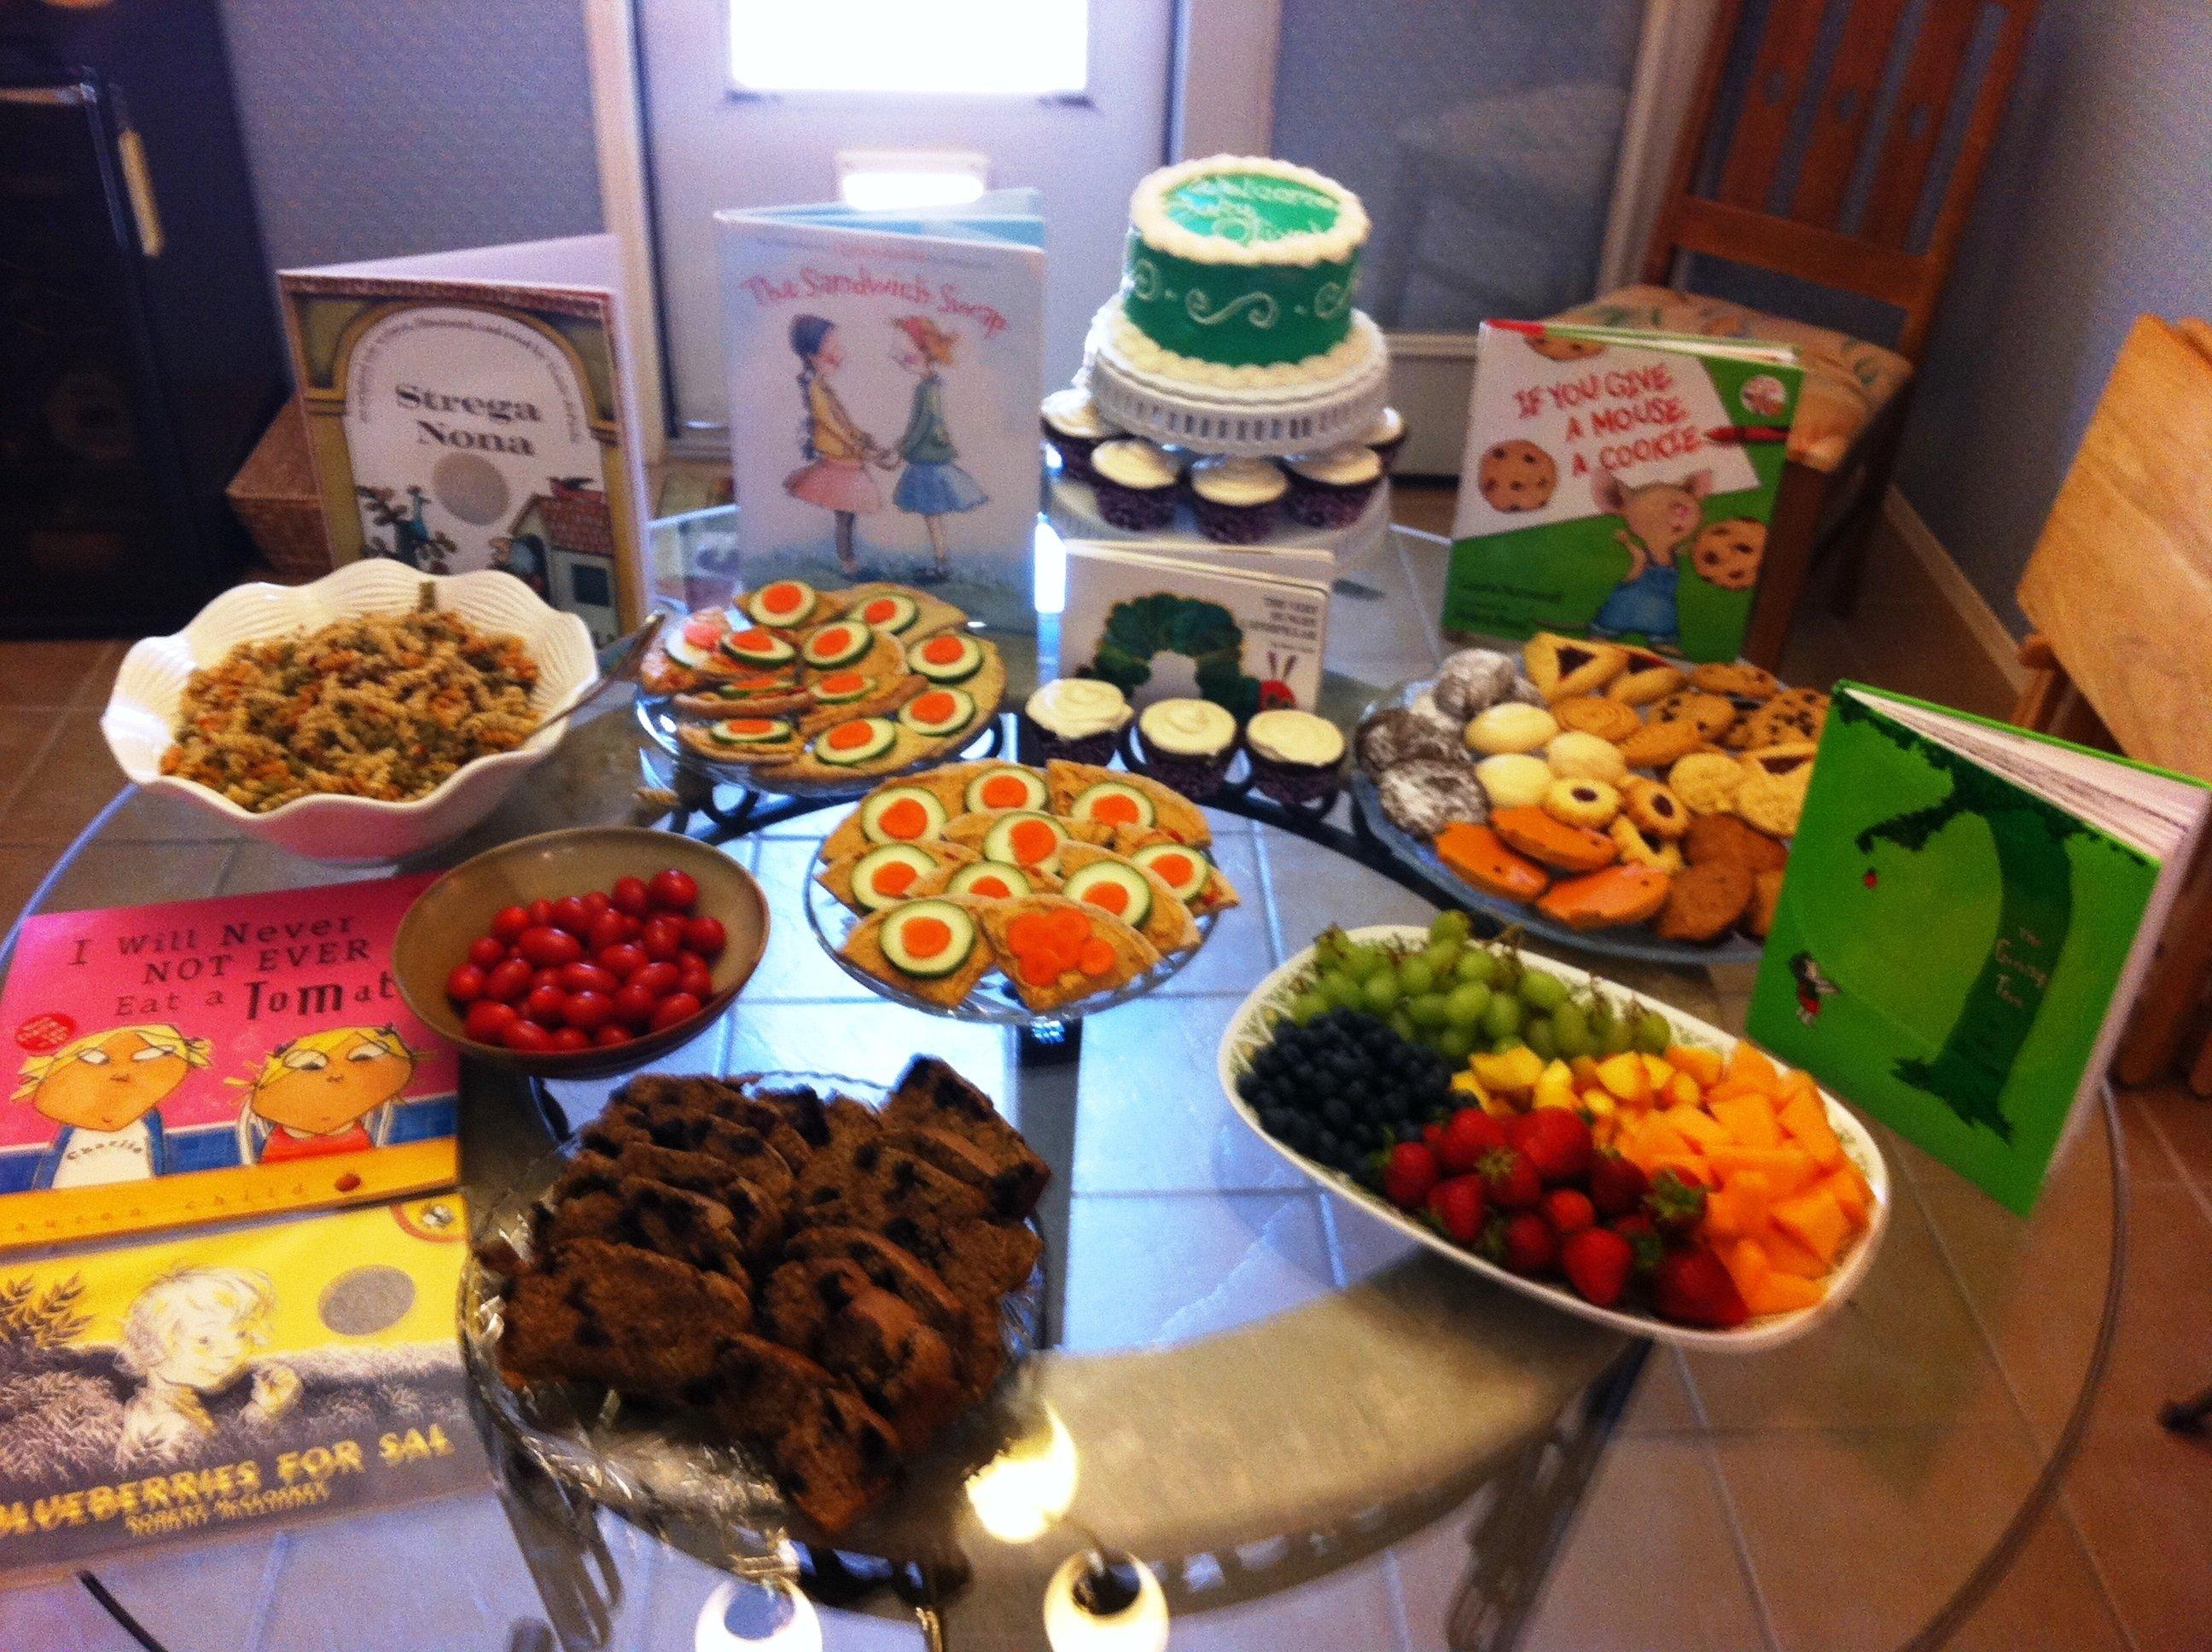 10 Spectacular Boy Baby Shower Food Ideas cool baby shower finger food ideas budget and baby shower ideas kits 16 2020